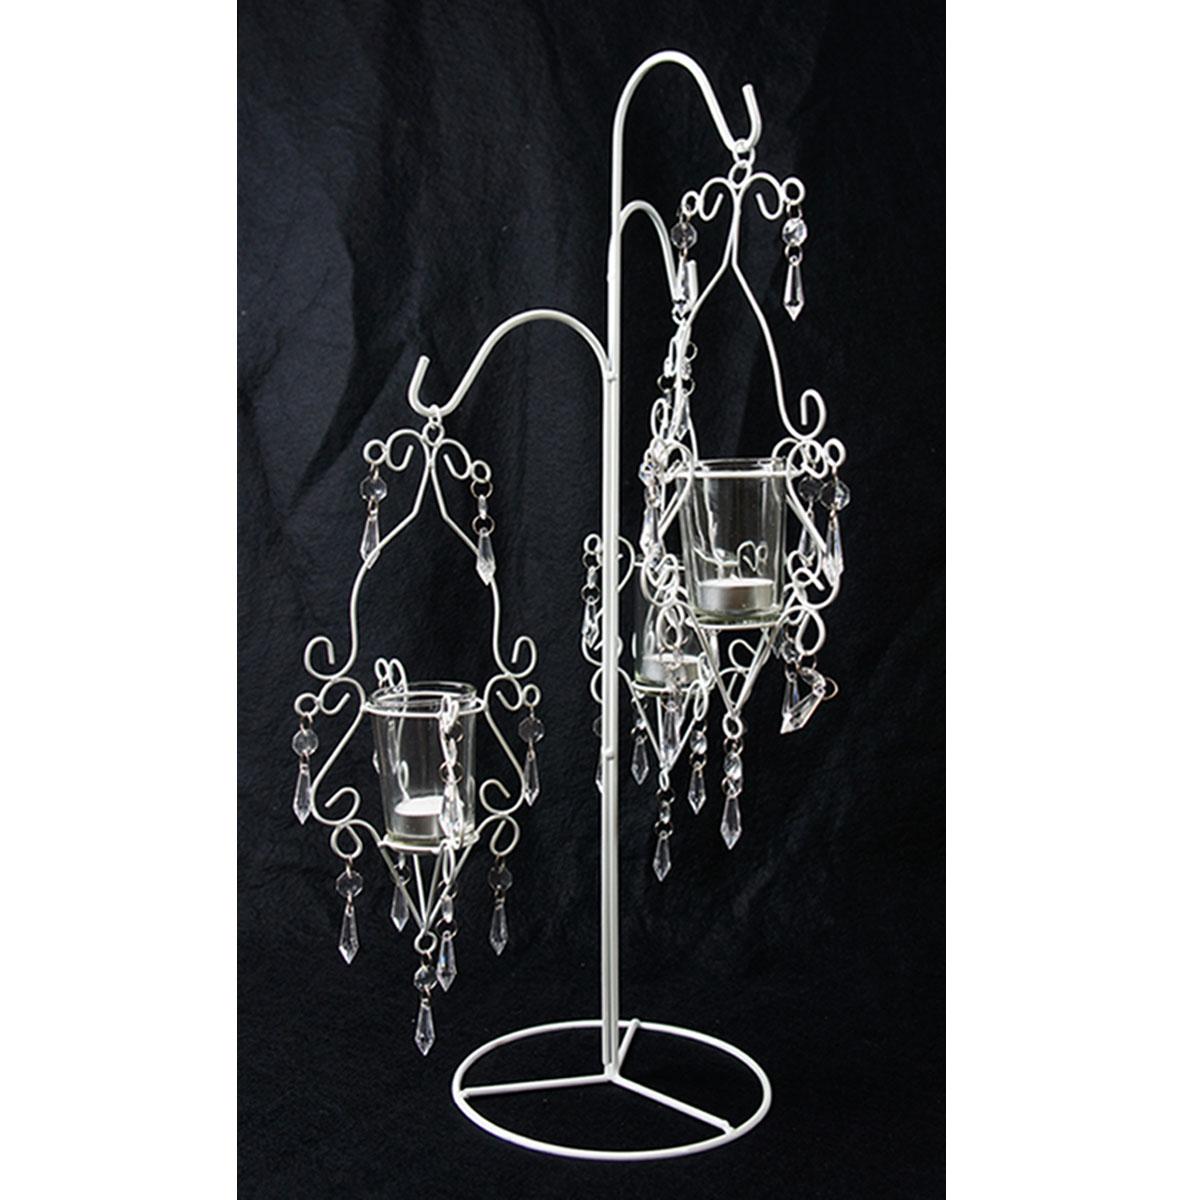 ifavor123.com: Double Pillar Hanging Acrylic Beads Candle Holder $40.00